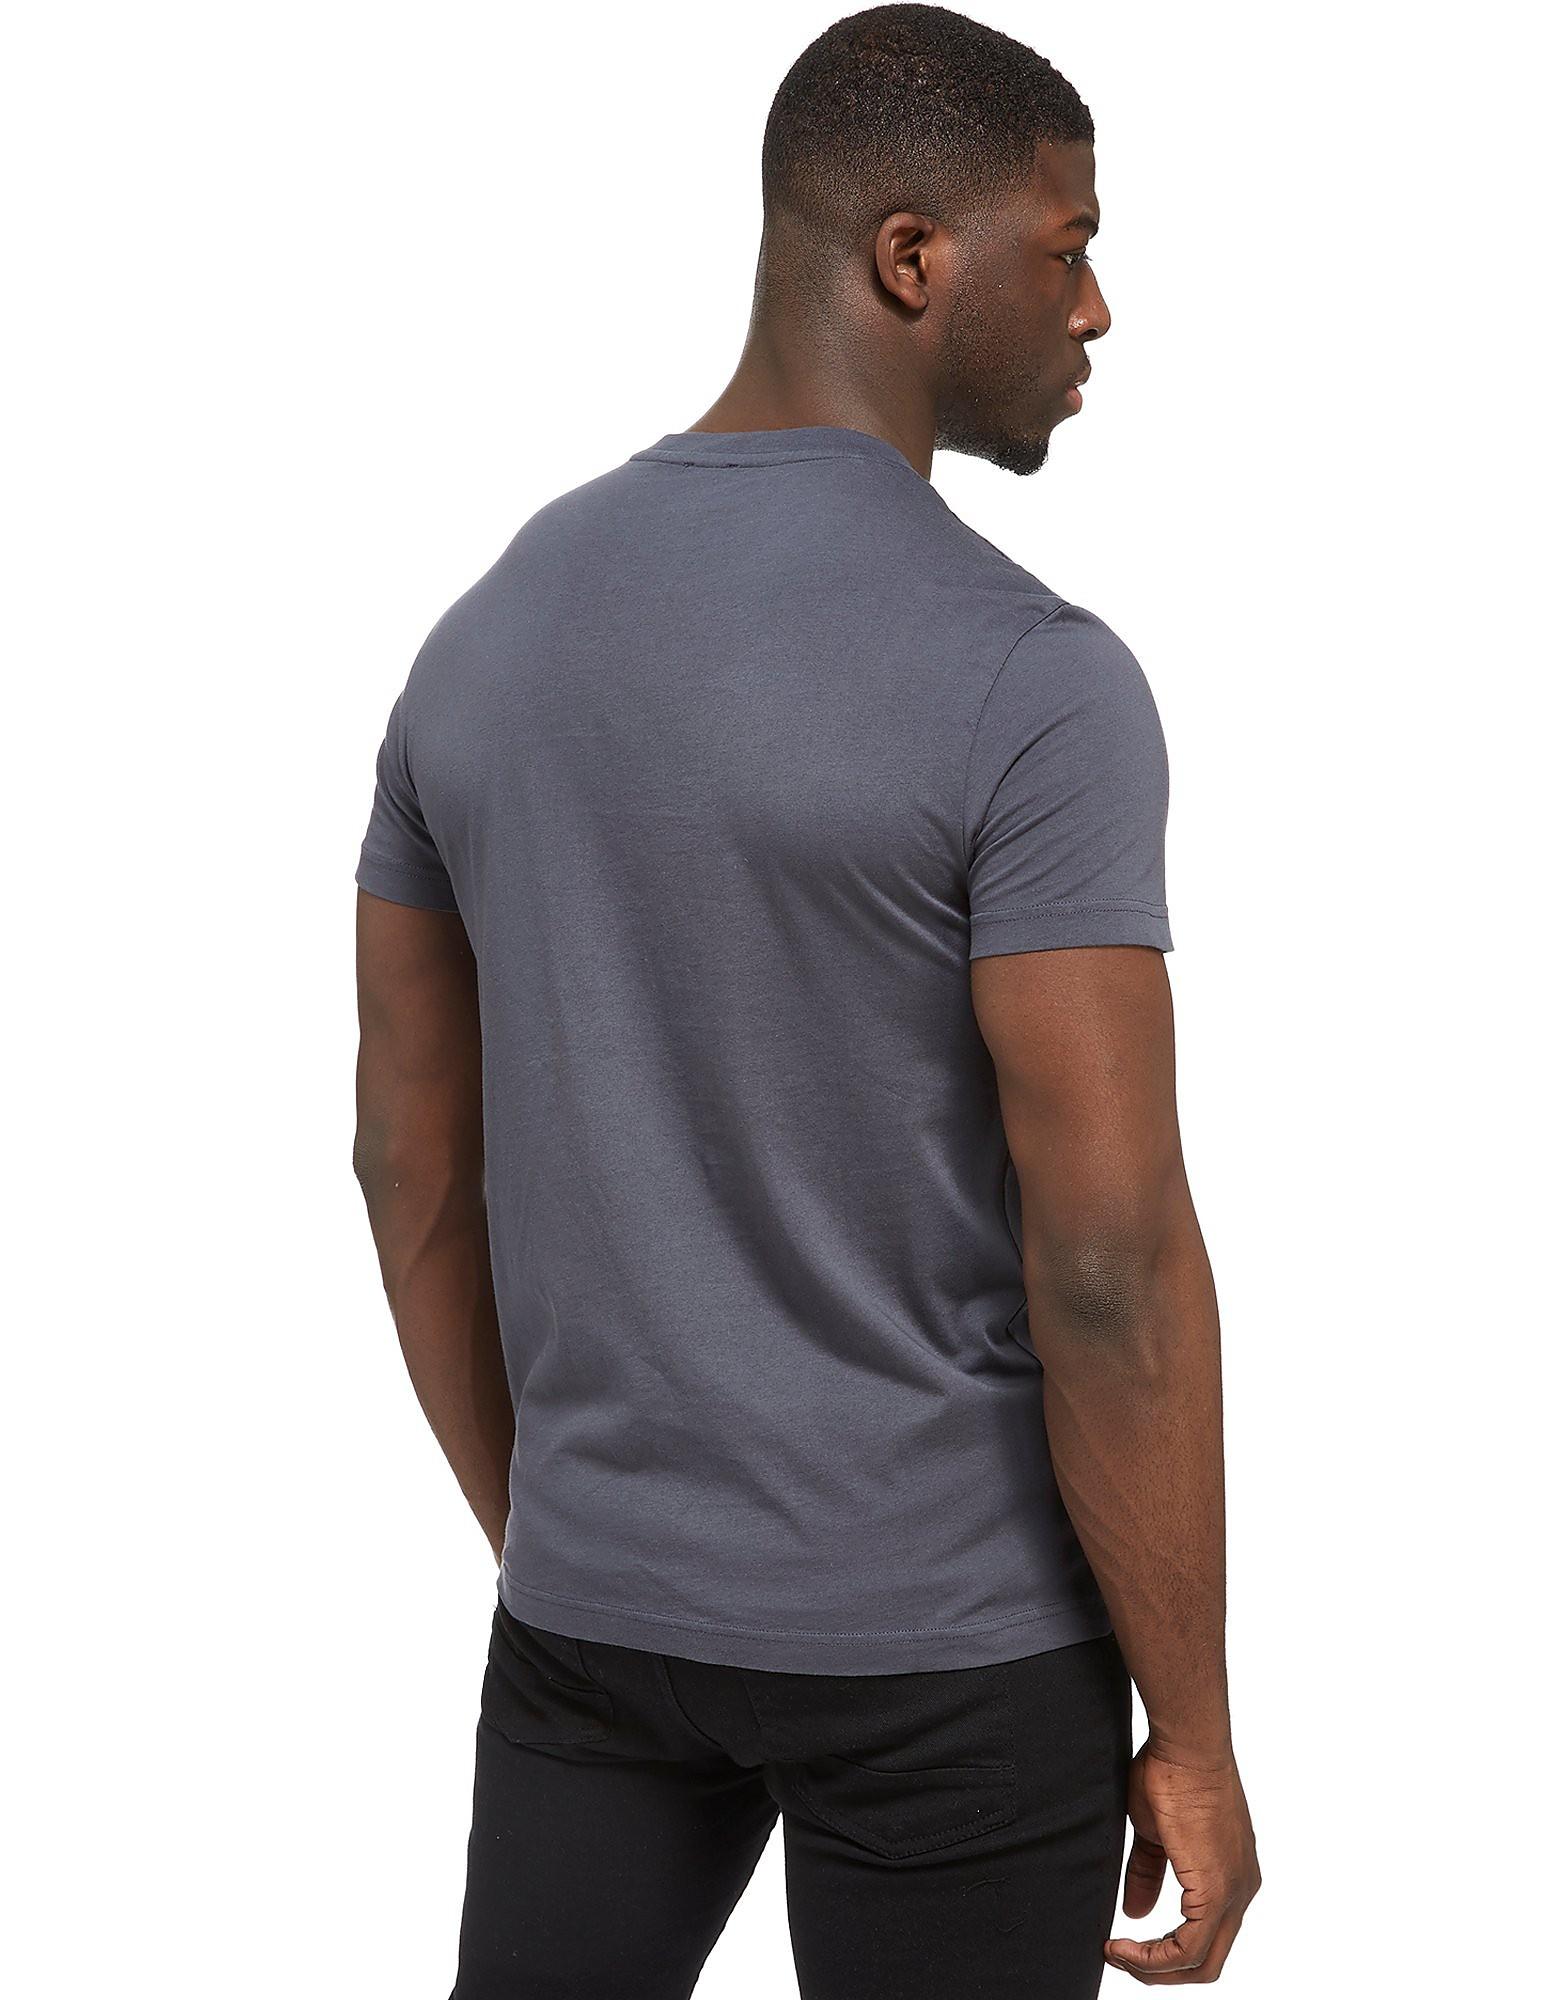 Emporio Armani EA7 Box Eagle T-Shirt